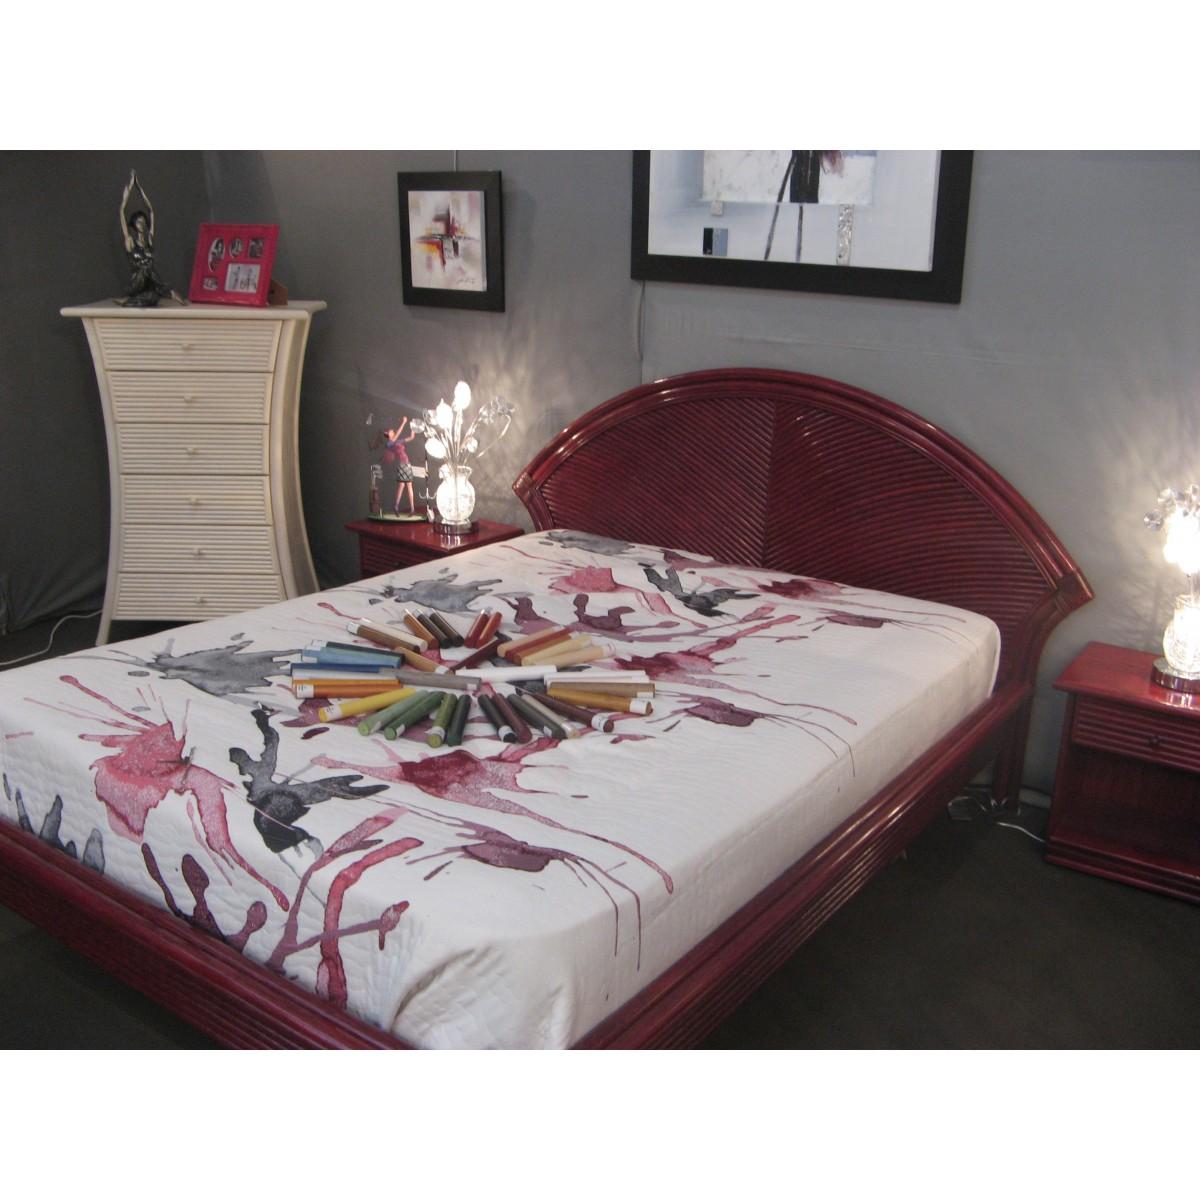 lit en rotin et filet de rotin hanoi. Black Bedroom Furniture Sets. Home Design Ideas